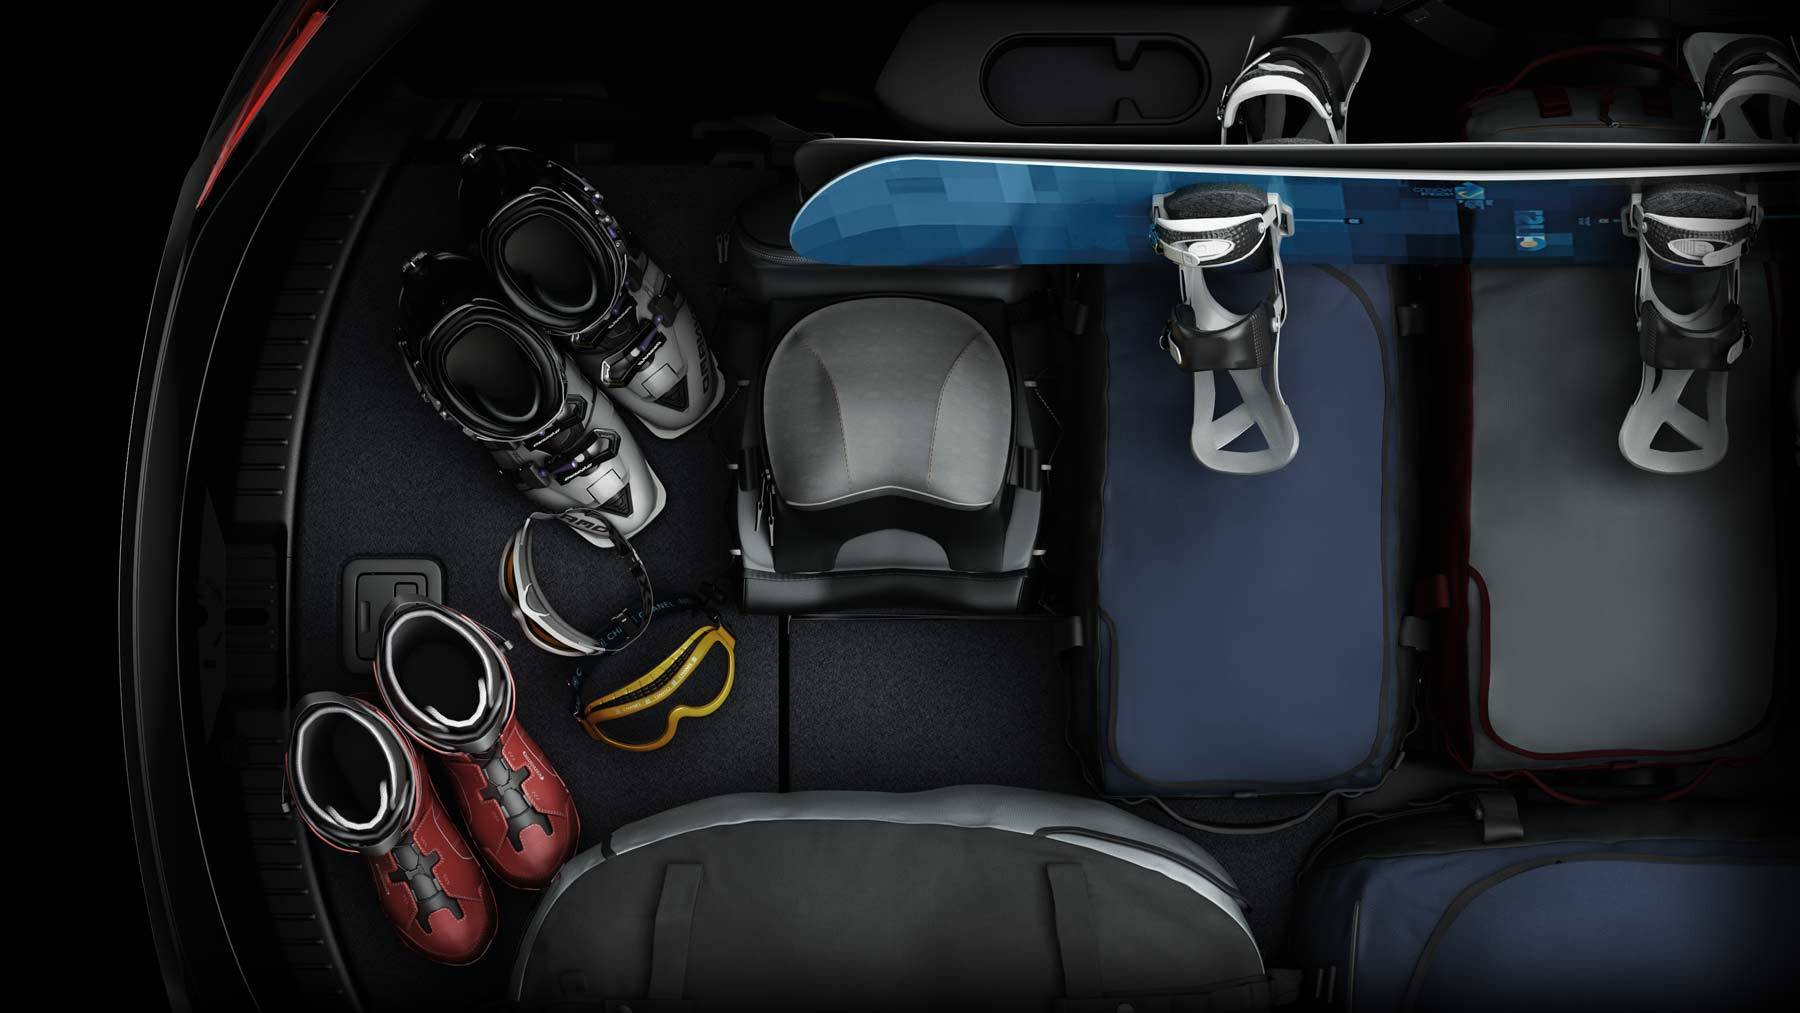 2019 Mazda CX-9 Cargo Space